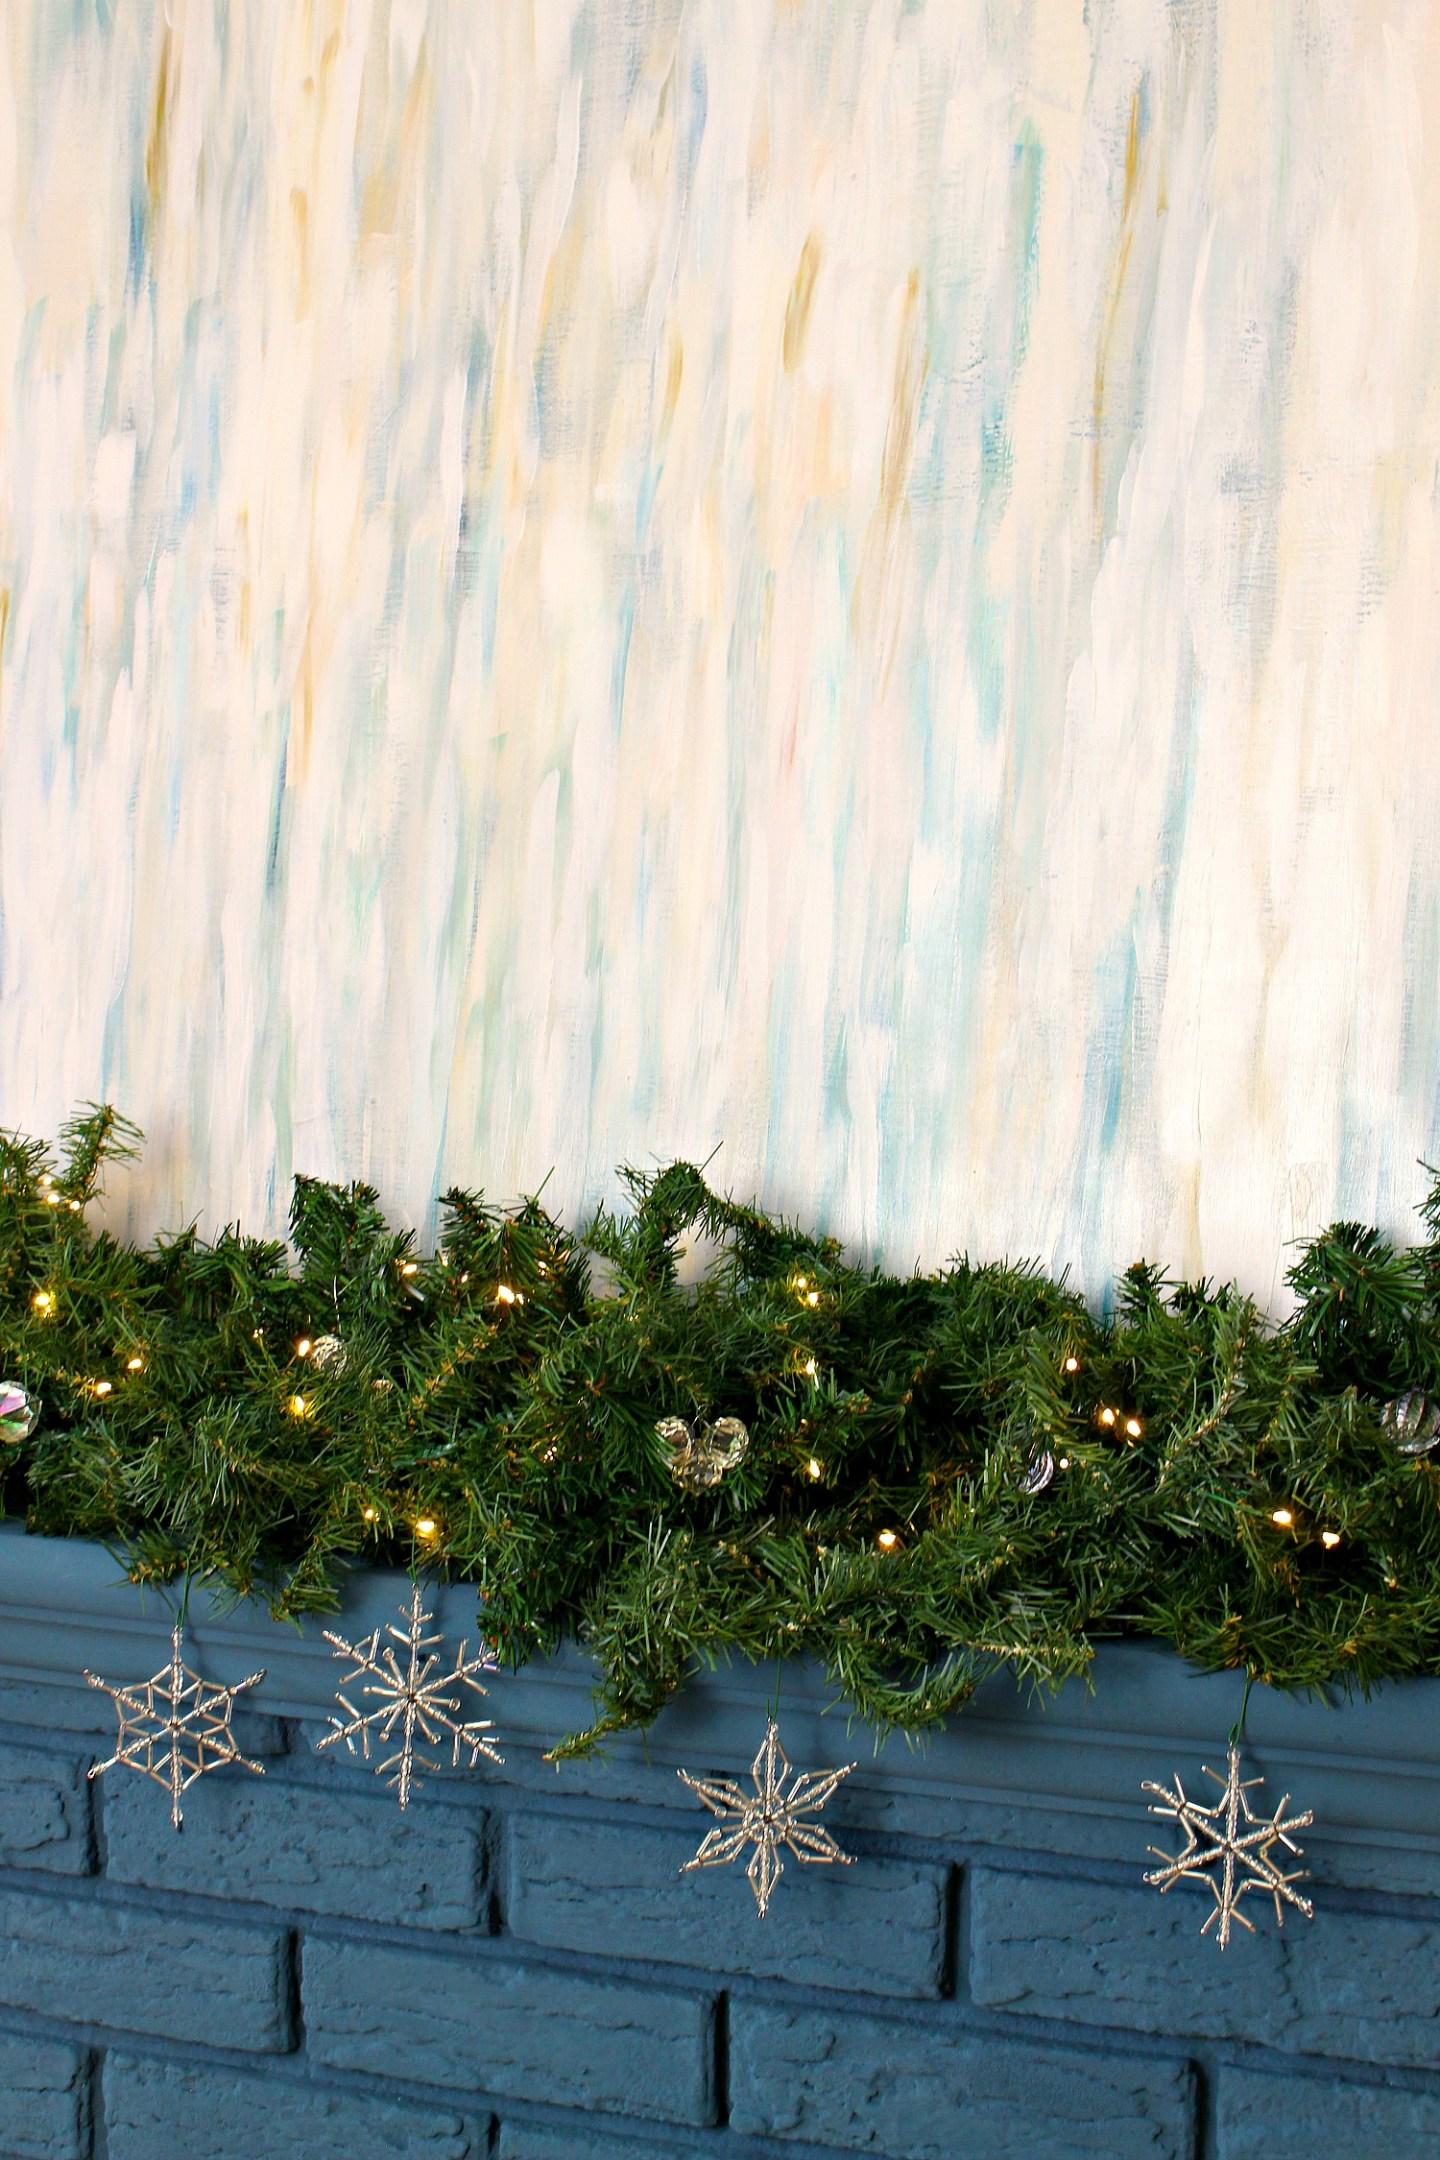 Snow Themed Mantel Decorating